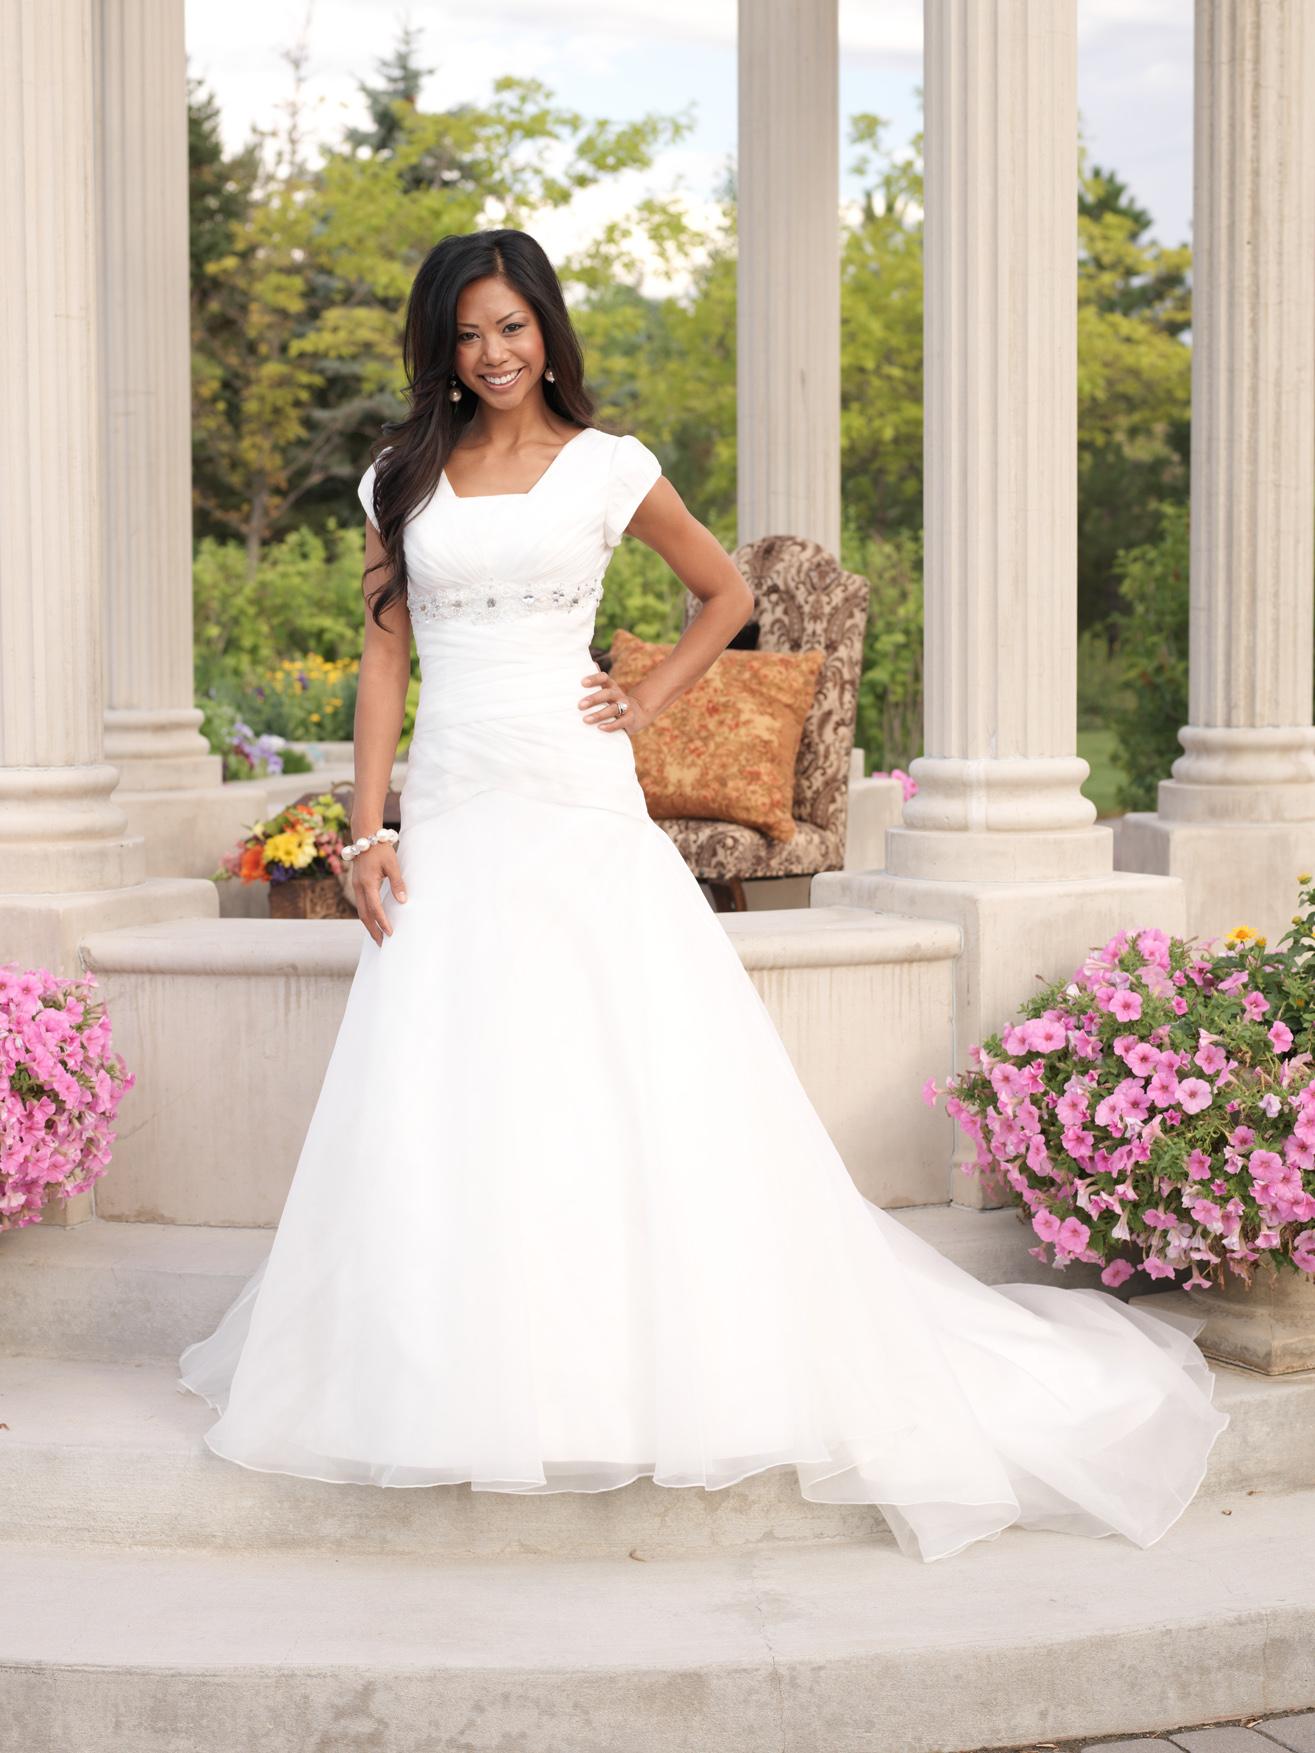 modest wedding dresses conservative wedding dress Wedding Dresses Modest